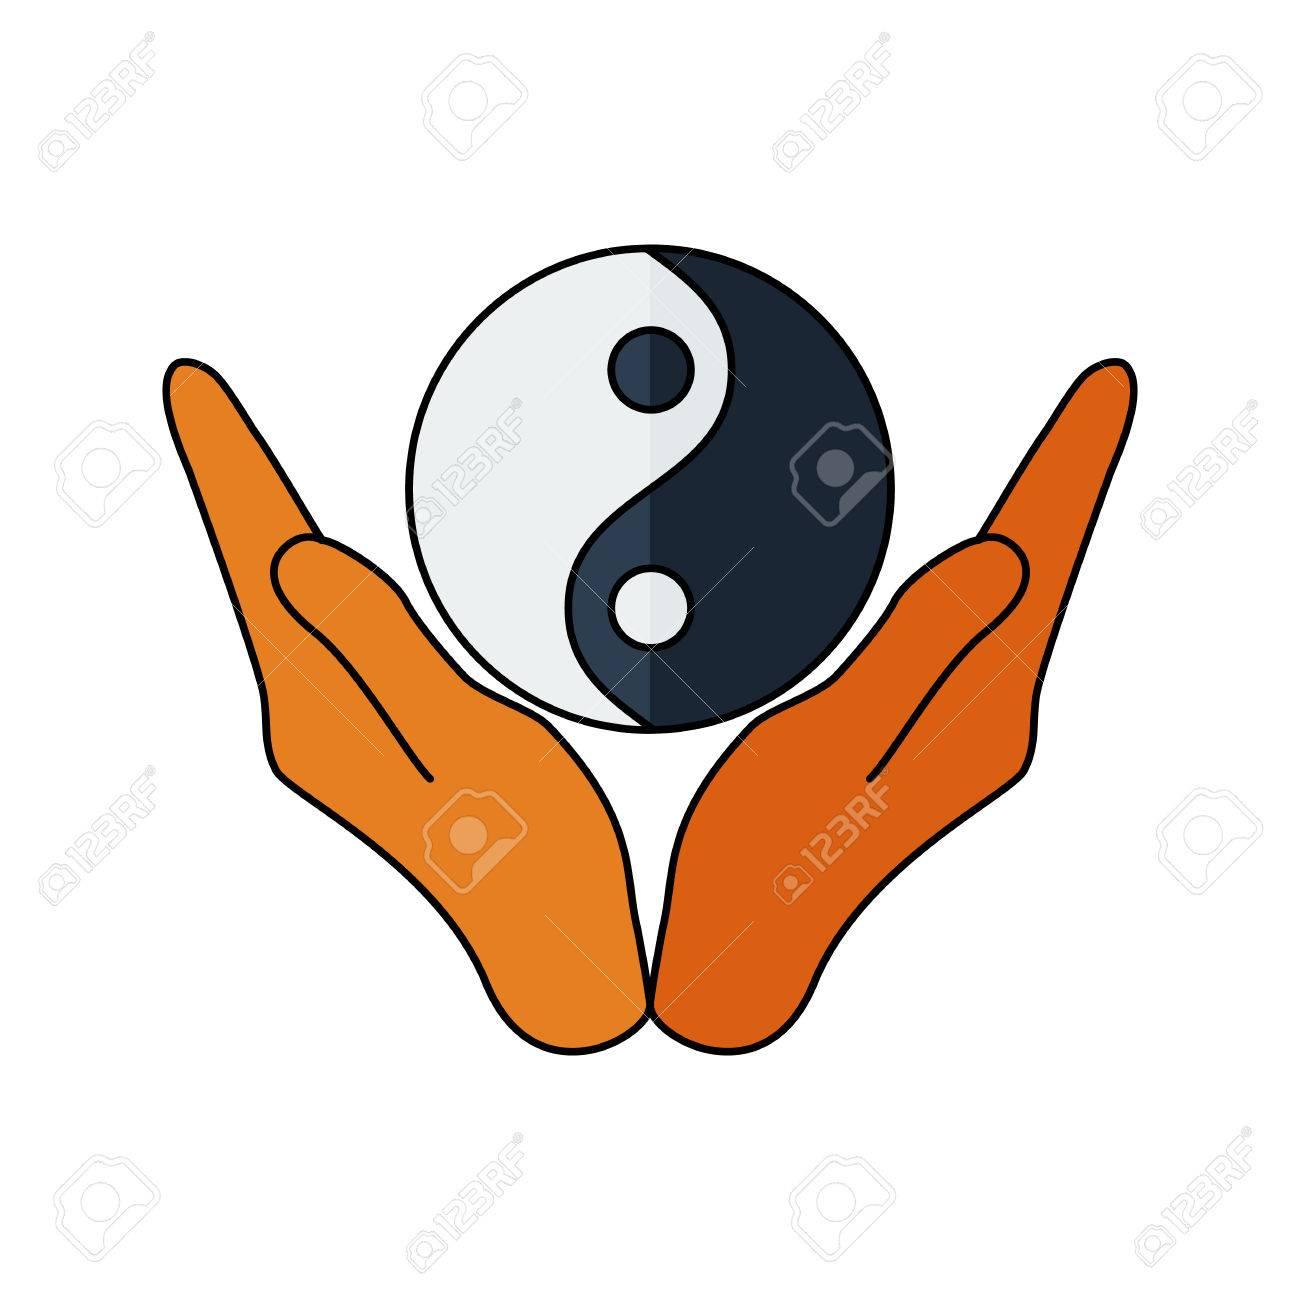 vector illustration of hands holding yin yang symbol religion rh 123rf com Vector Wings Colorful Yin Yang